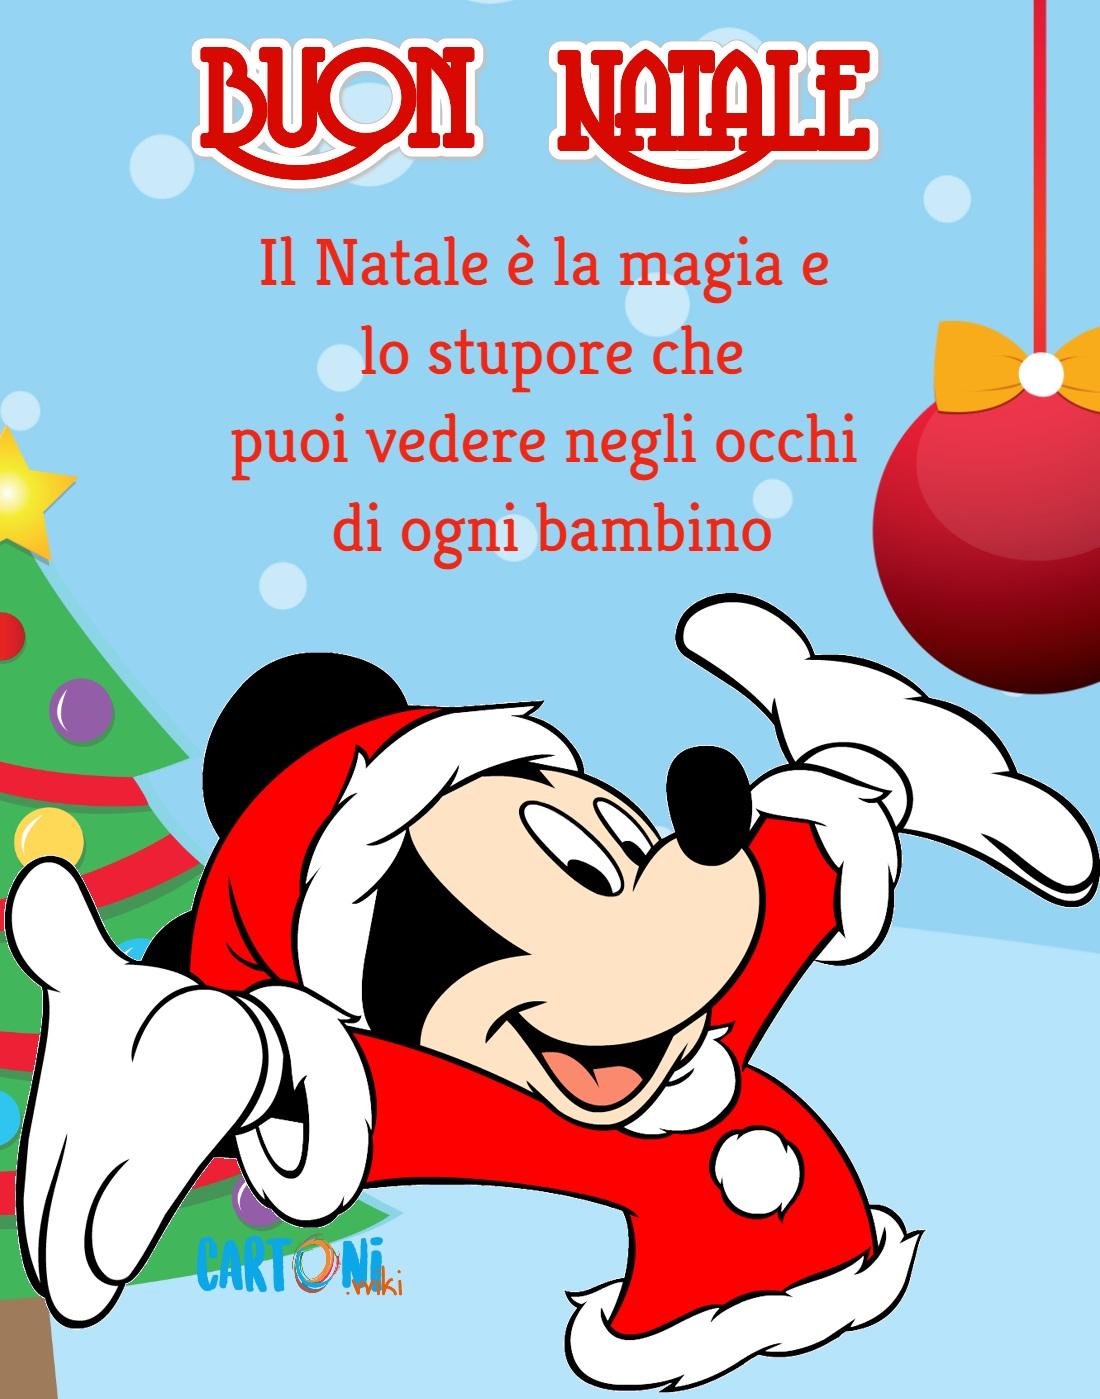 Frasi Di Buon Natale Per Bambini.Buon Natale A Tutti I Bambini Cartoni Animati